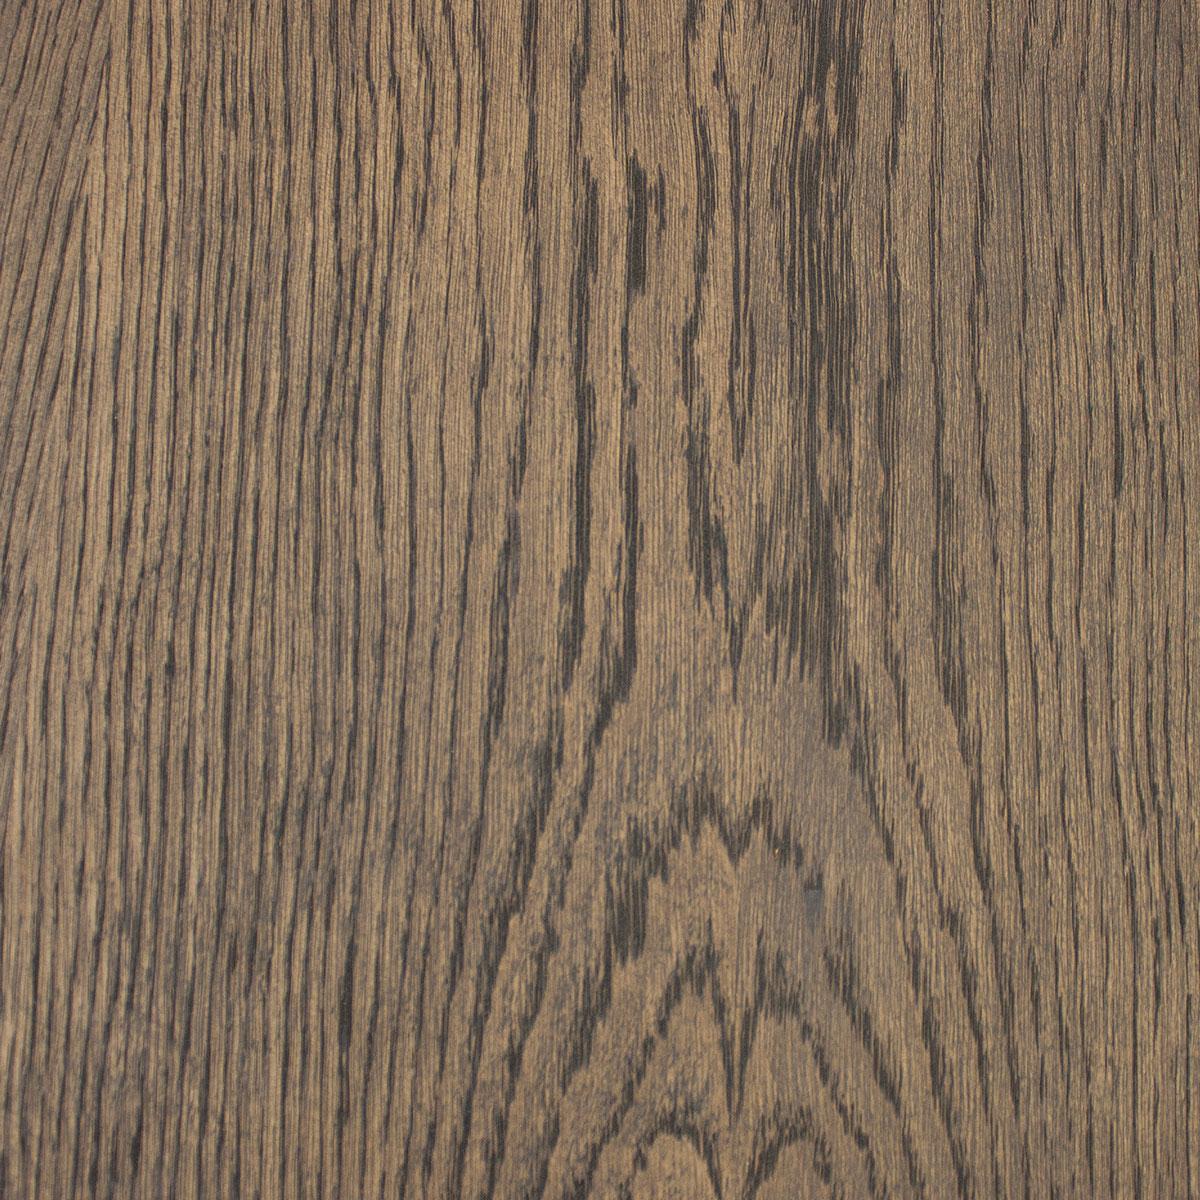 Loop Coffee Table Top | Oak Monocoat Top | Charcoal Swatch